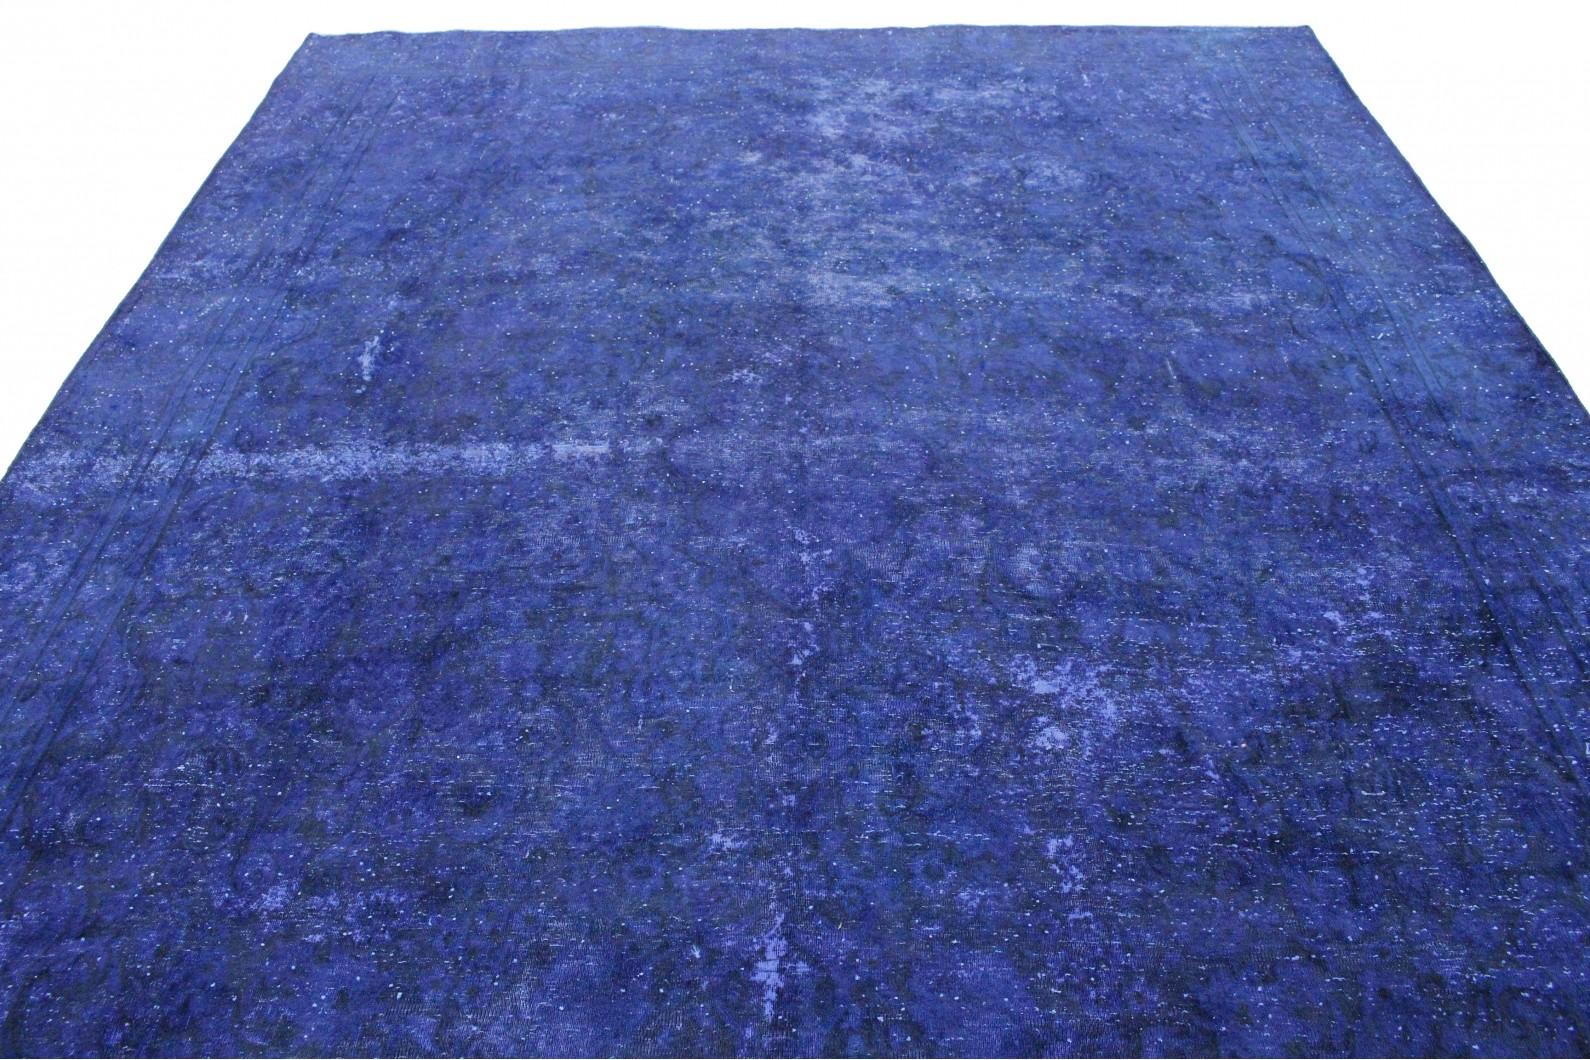 vintage teppich ultramarinblau blau lila in 370x270 1001 167209 bei kaufen. Black Bedroom Furniture Sets. Home Design Ideas